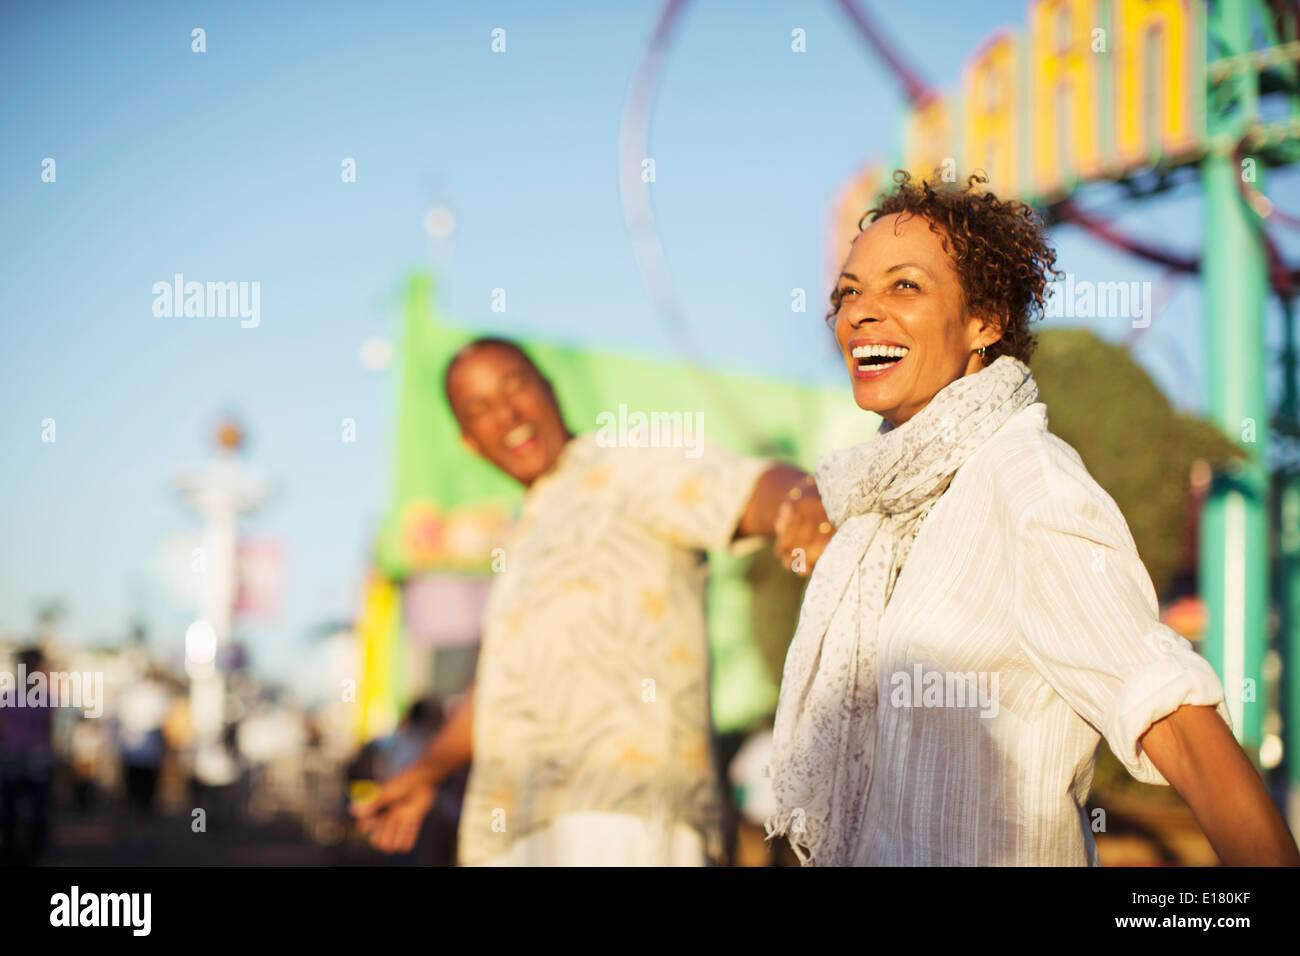 Enthusiastic couple at amusement park - Stock Image